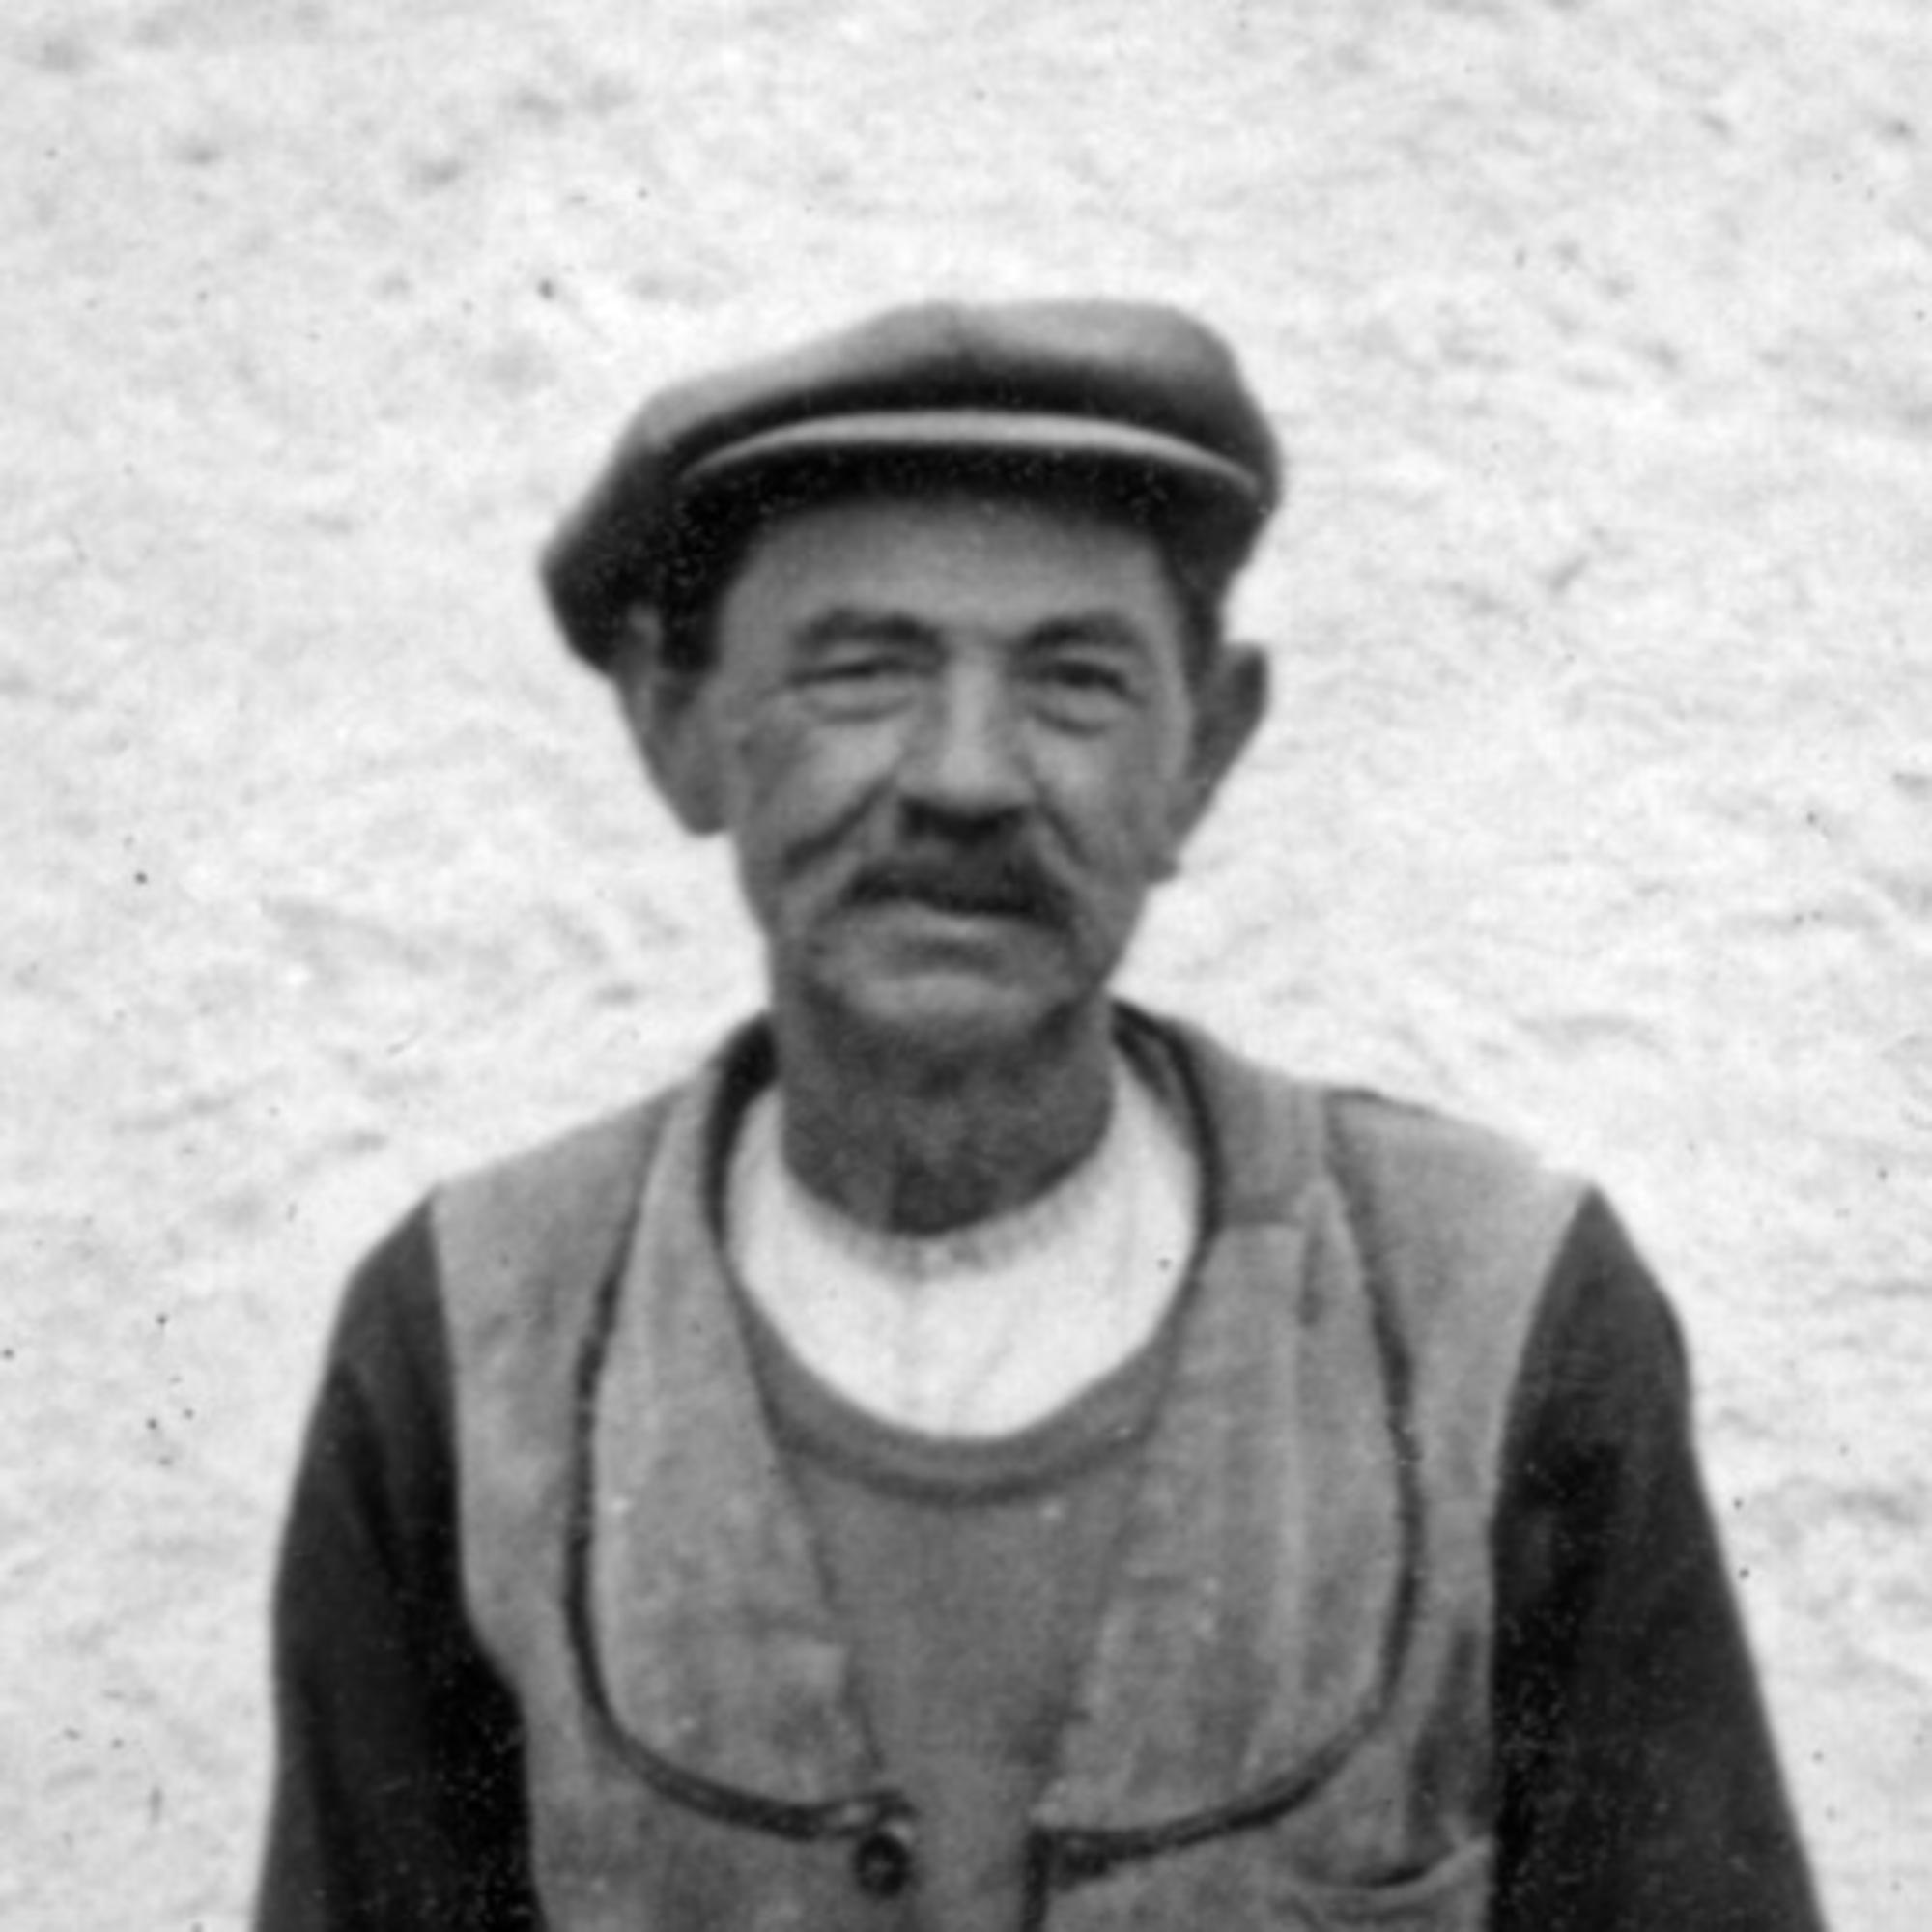 Jean Perrodot portrait